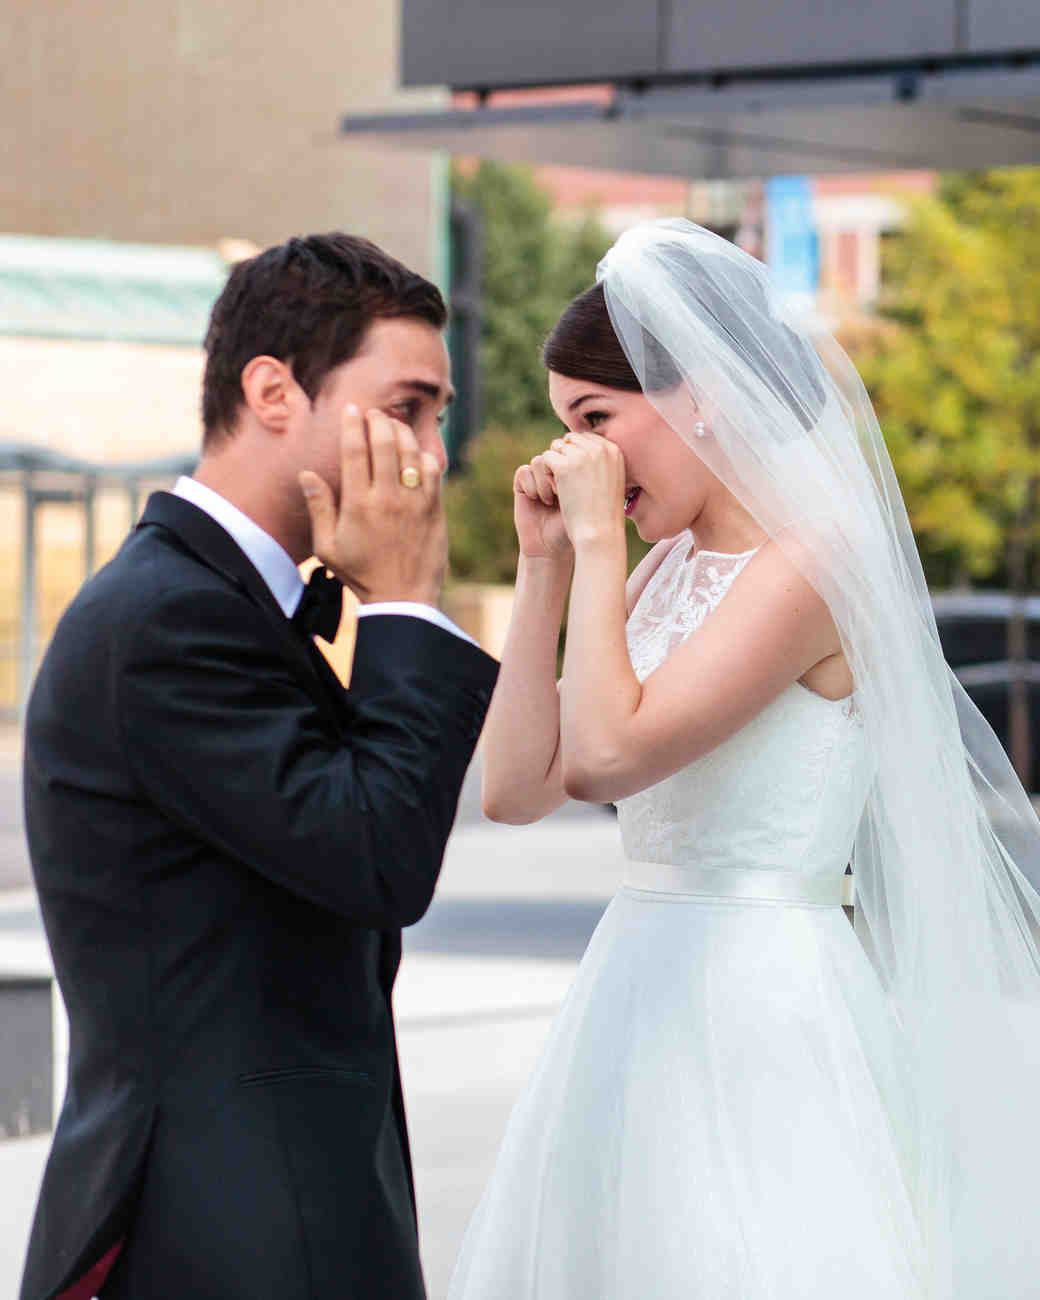 ashley-ryan-wedding-firstlook-8825-s111852-0415.jpg